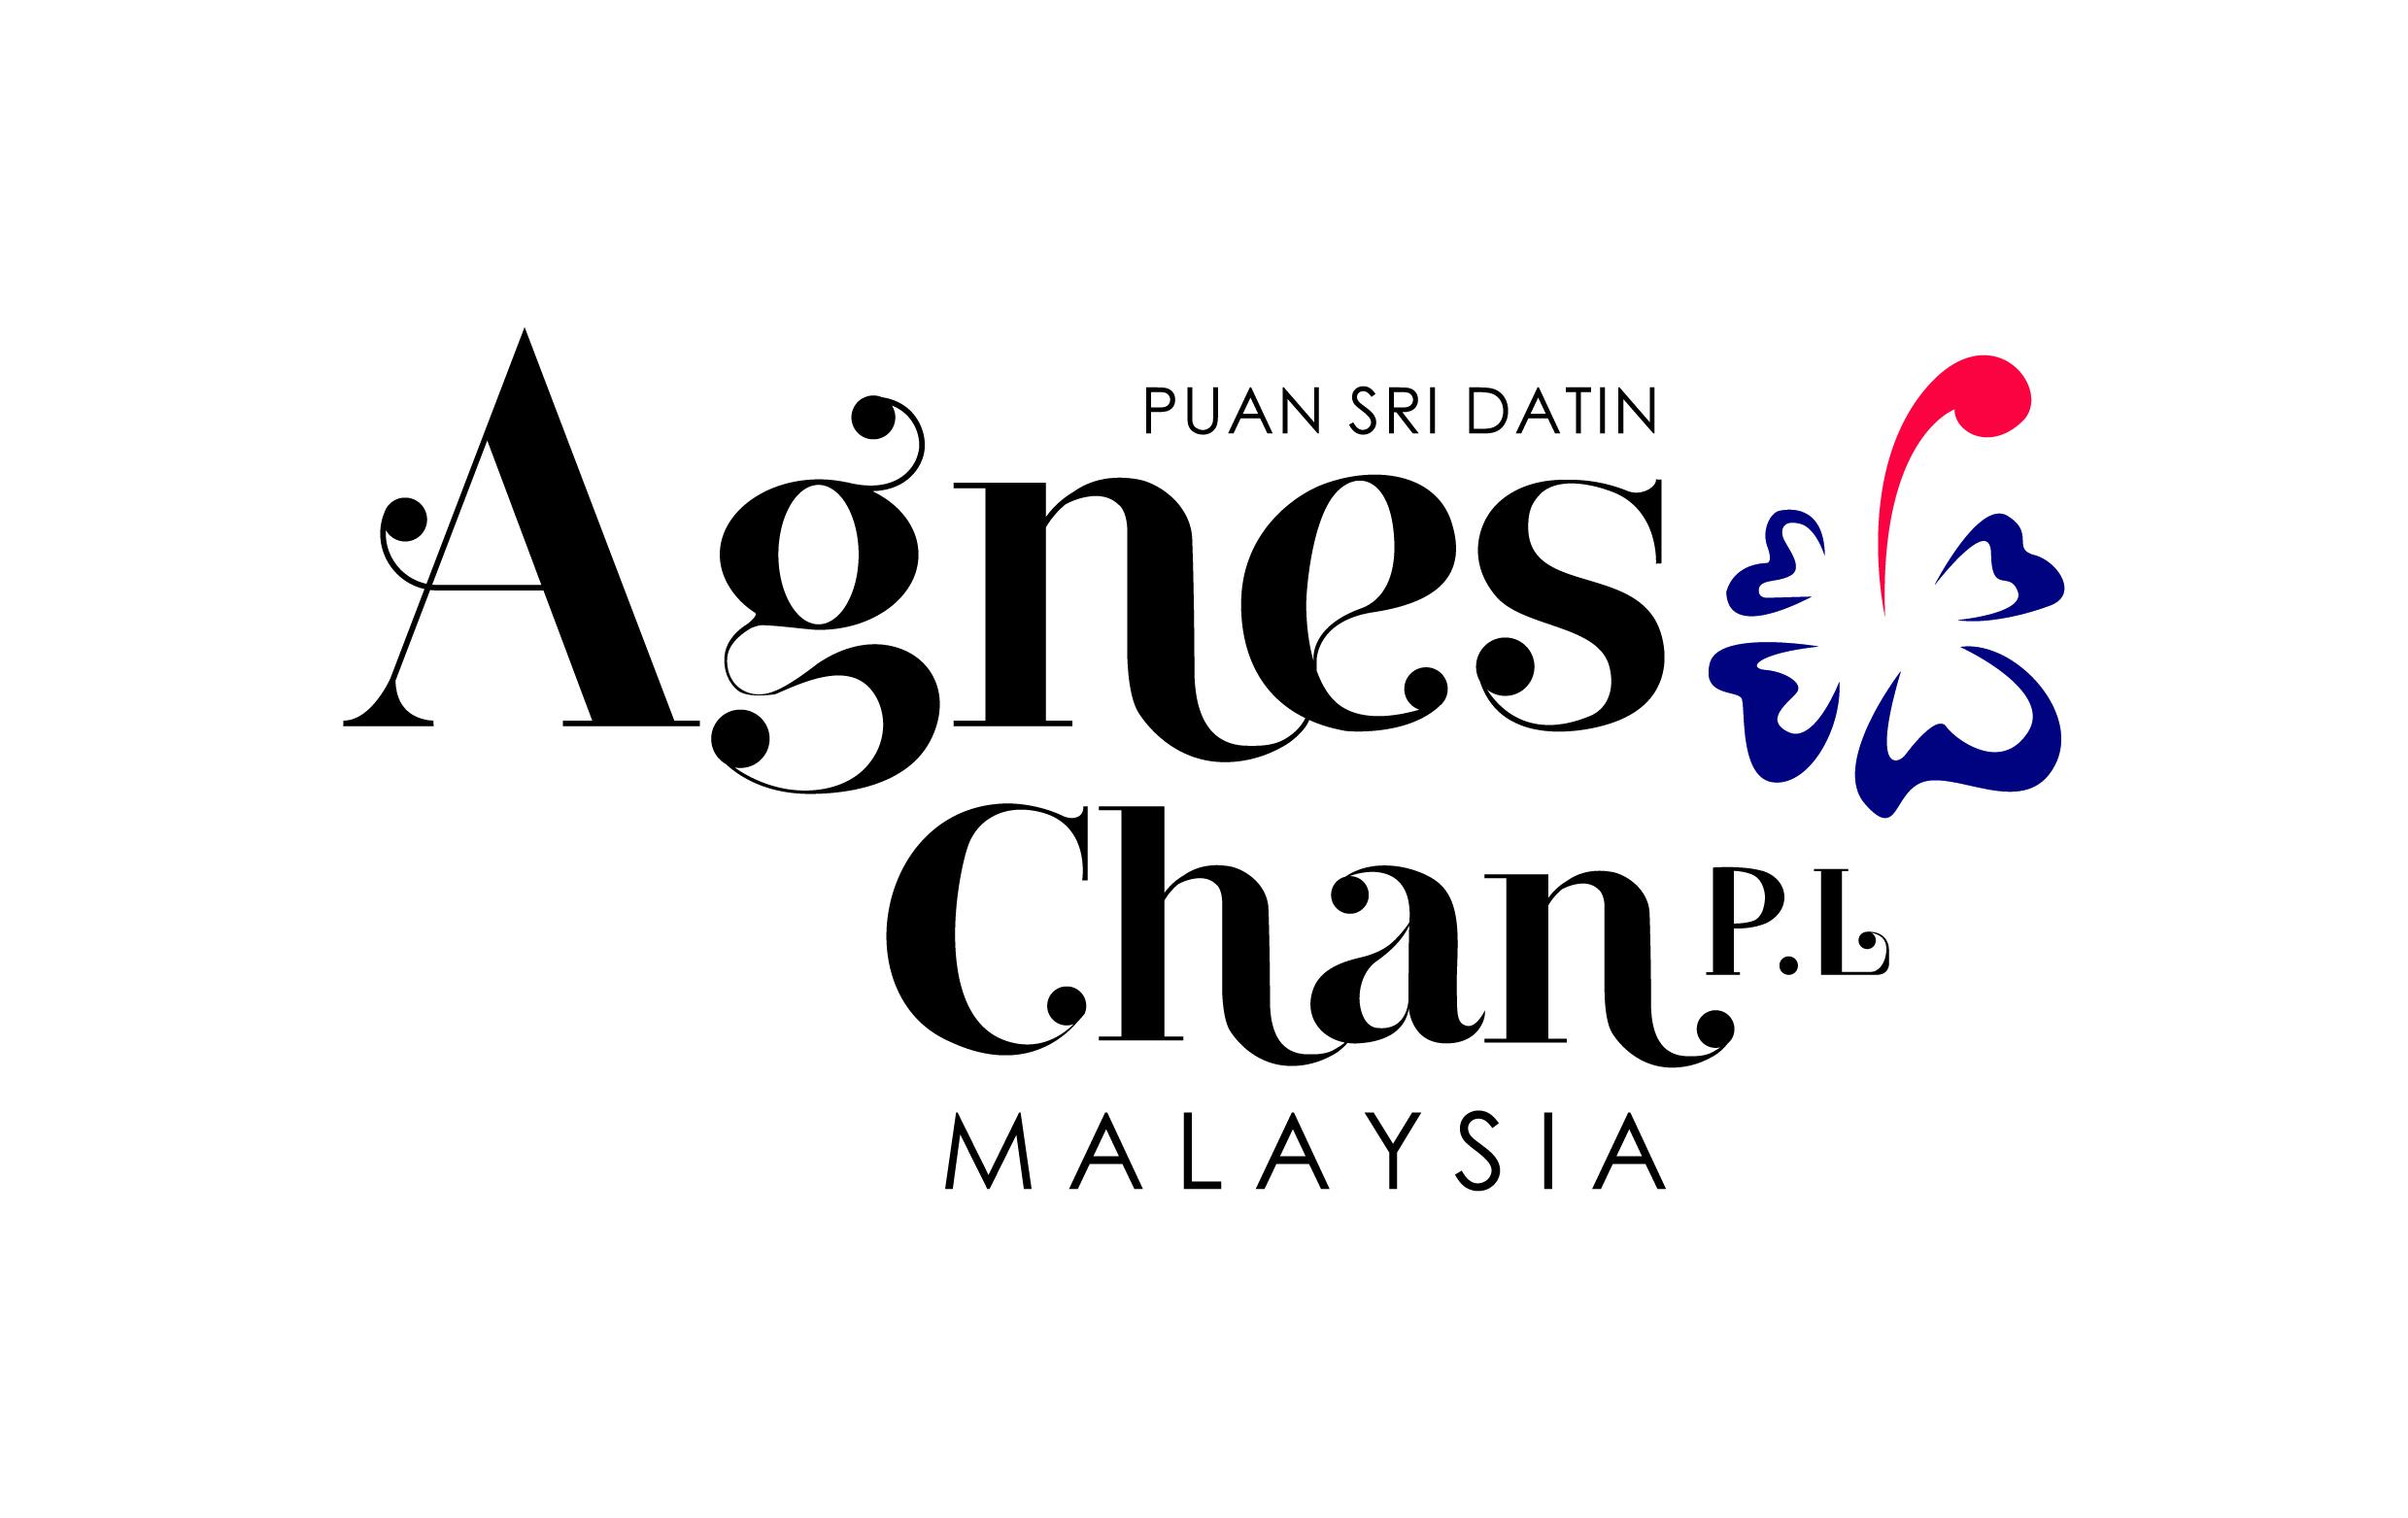 Puan Sri Datin Agnes Chan, Malaysia